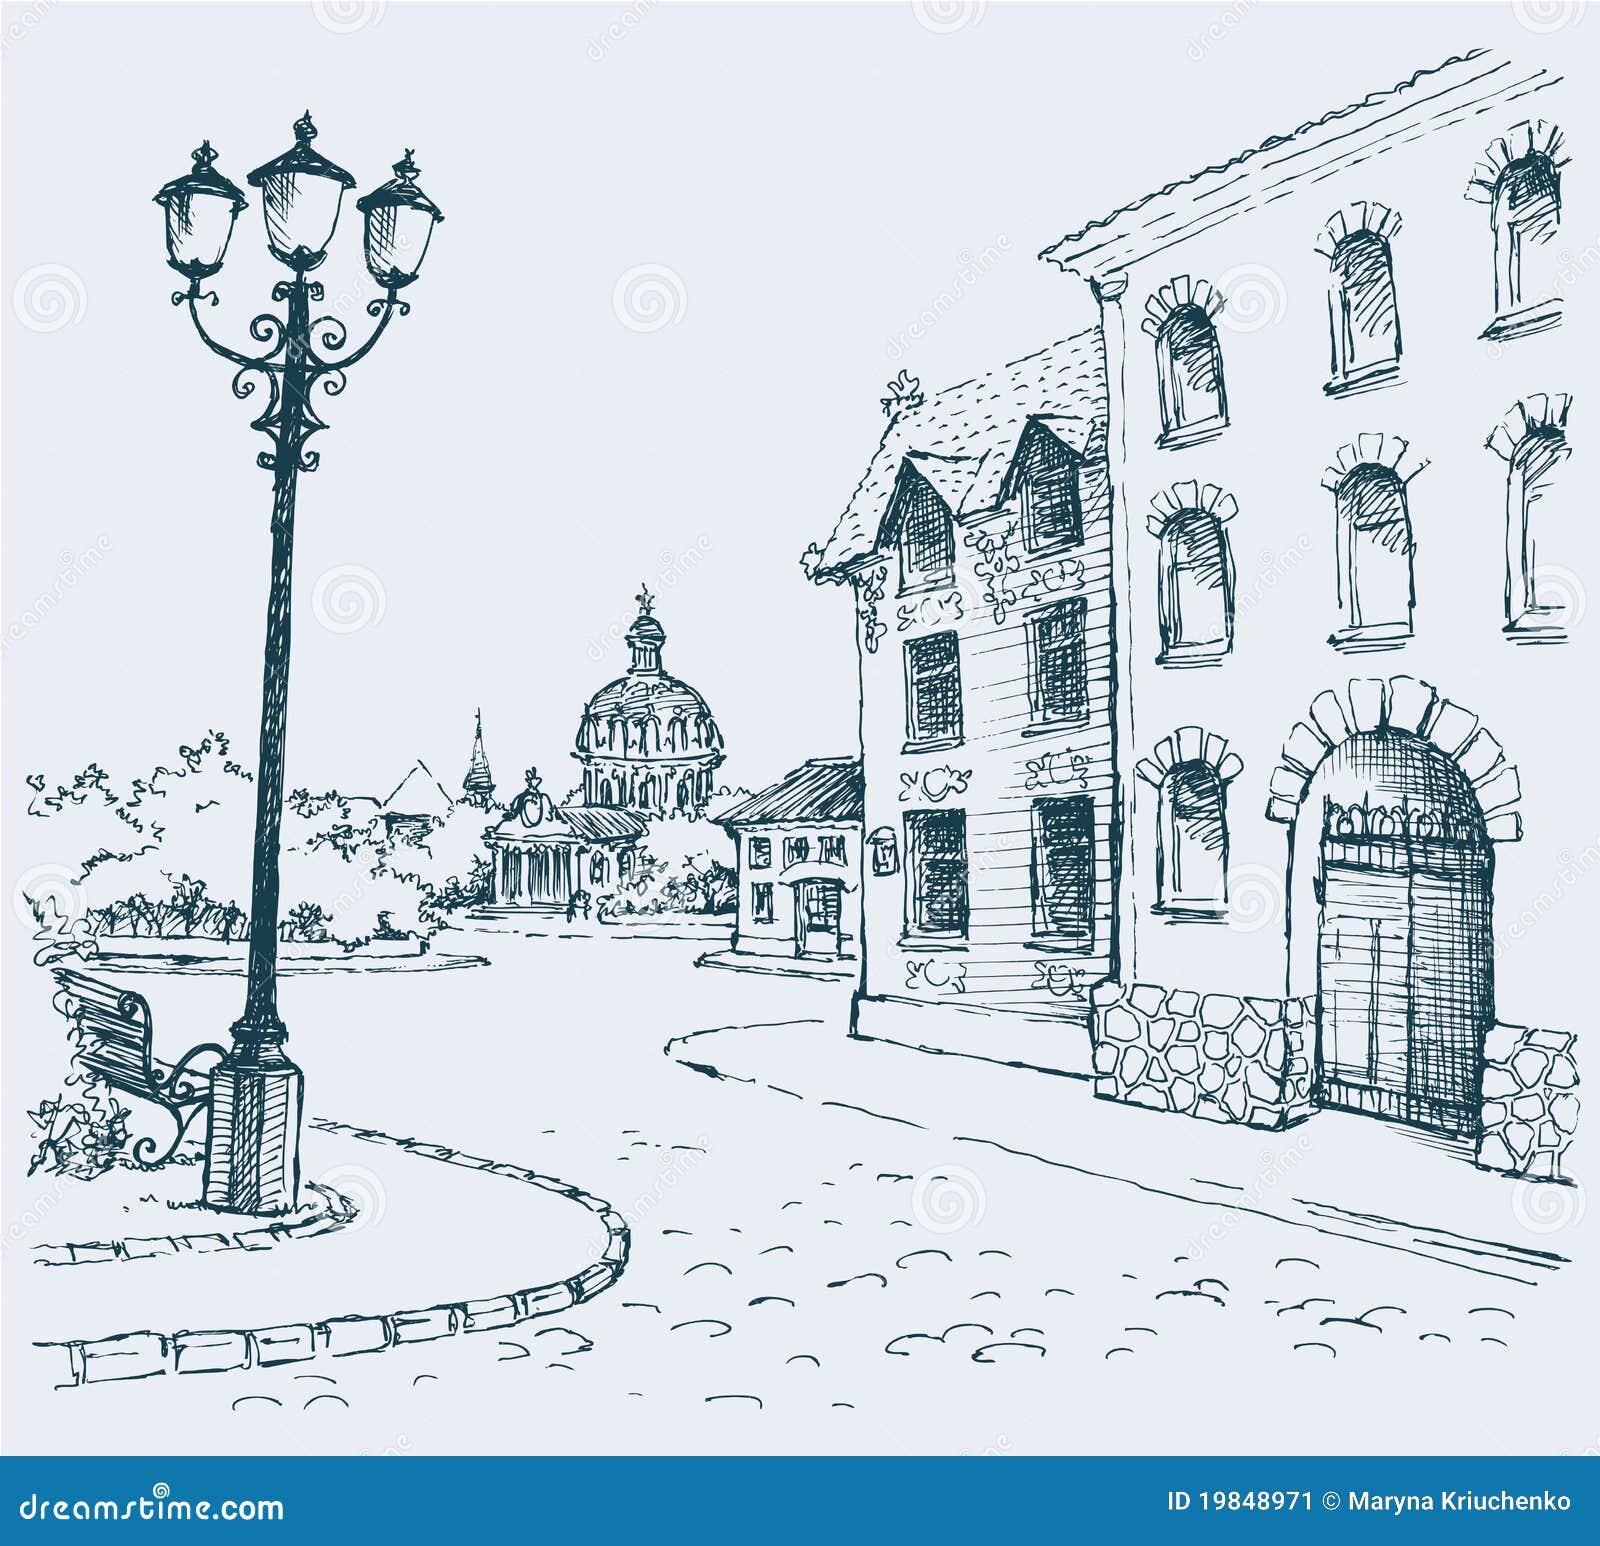 El paisaje arquitectónico